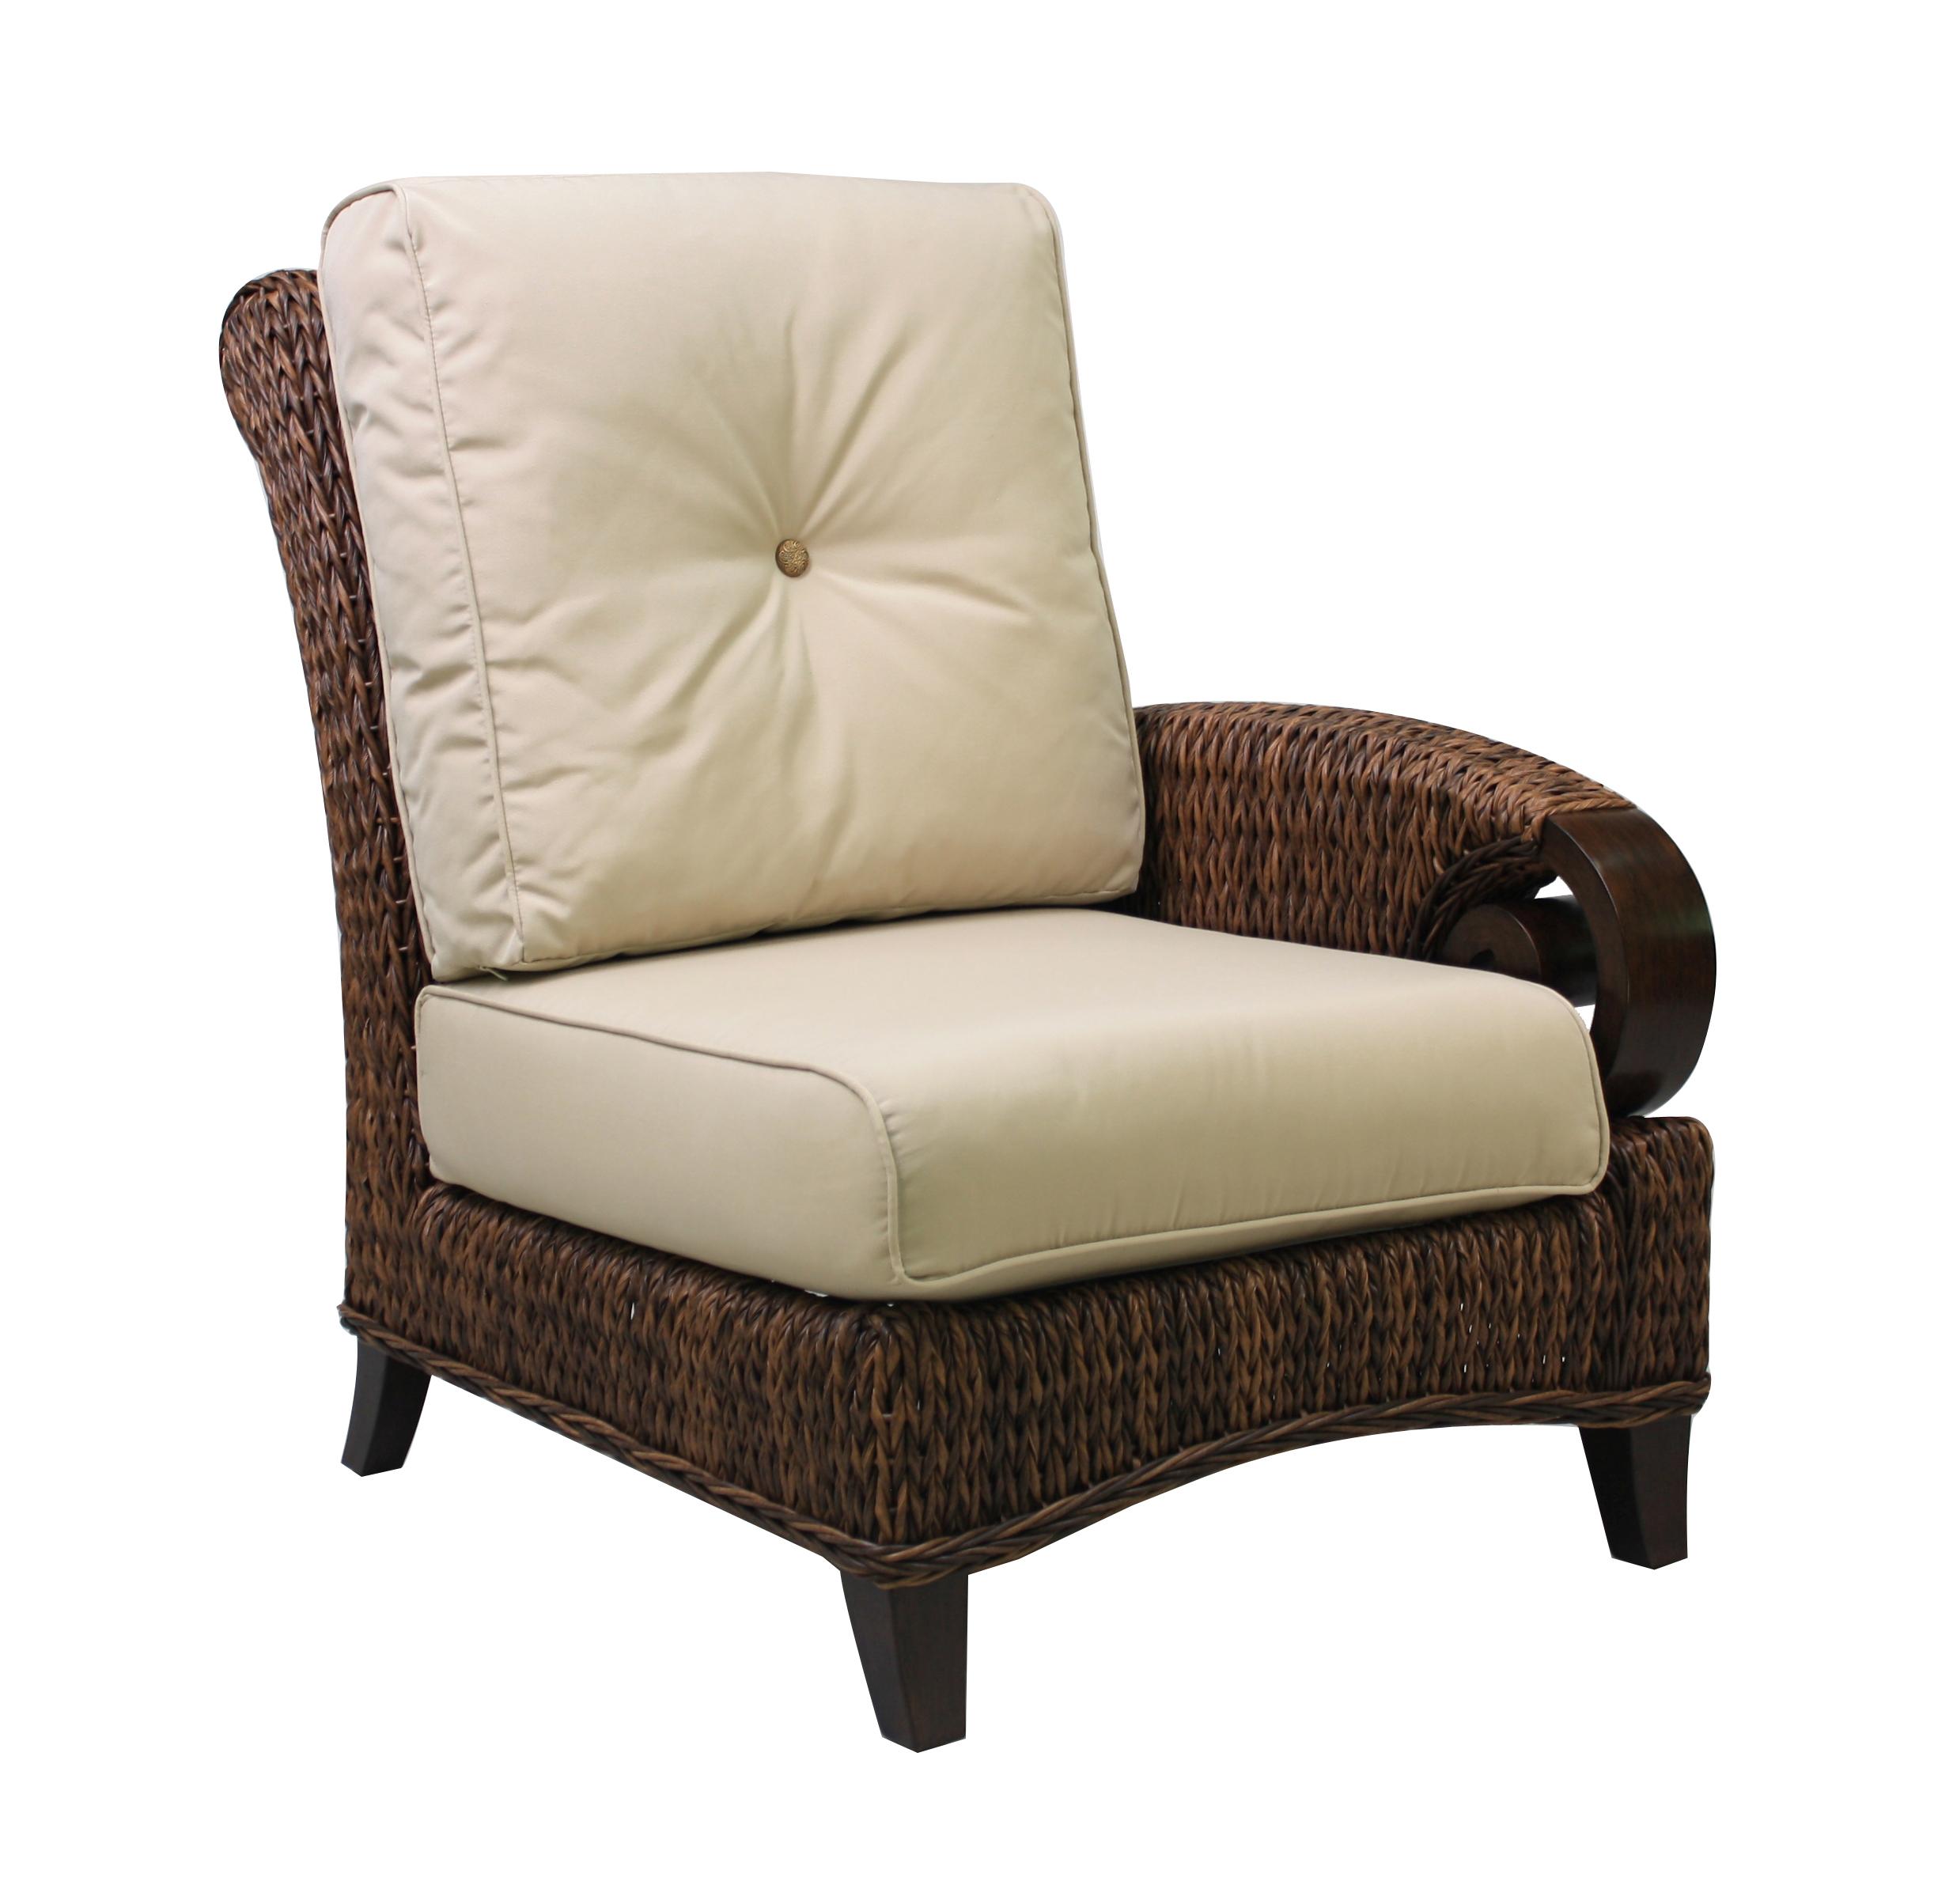 "973831R Antigua Right Corner Chair   30.2"" x 40.8"" x 38.9"""